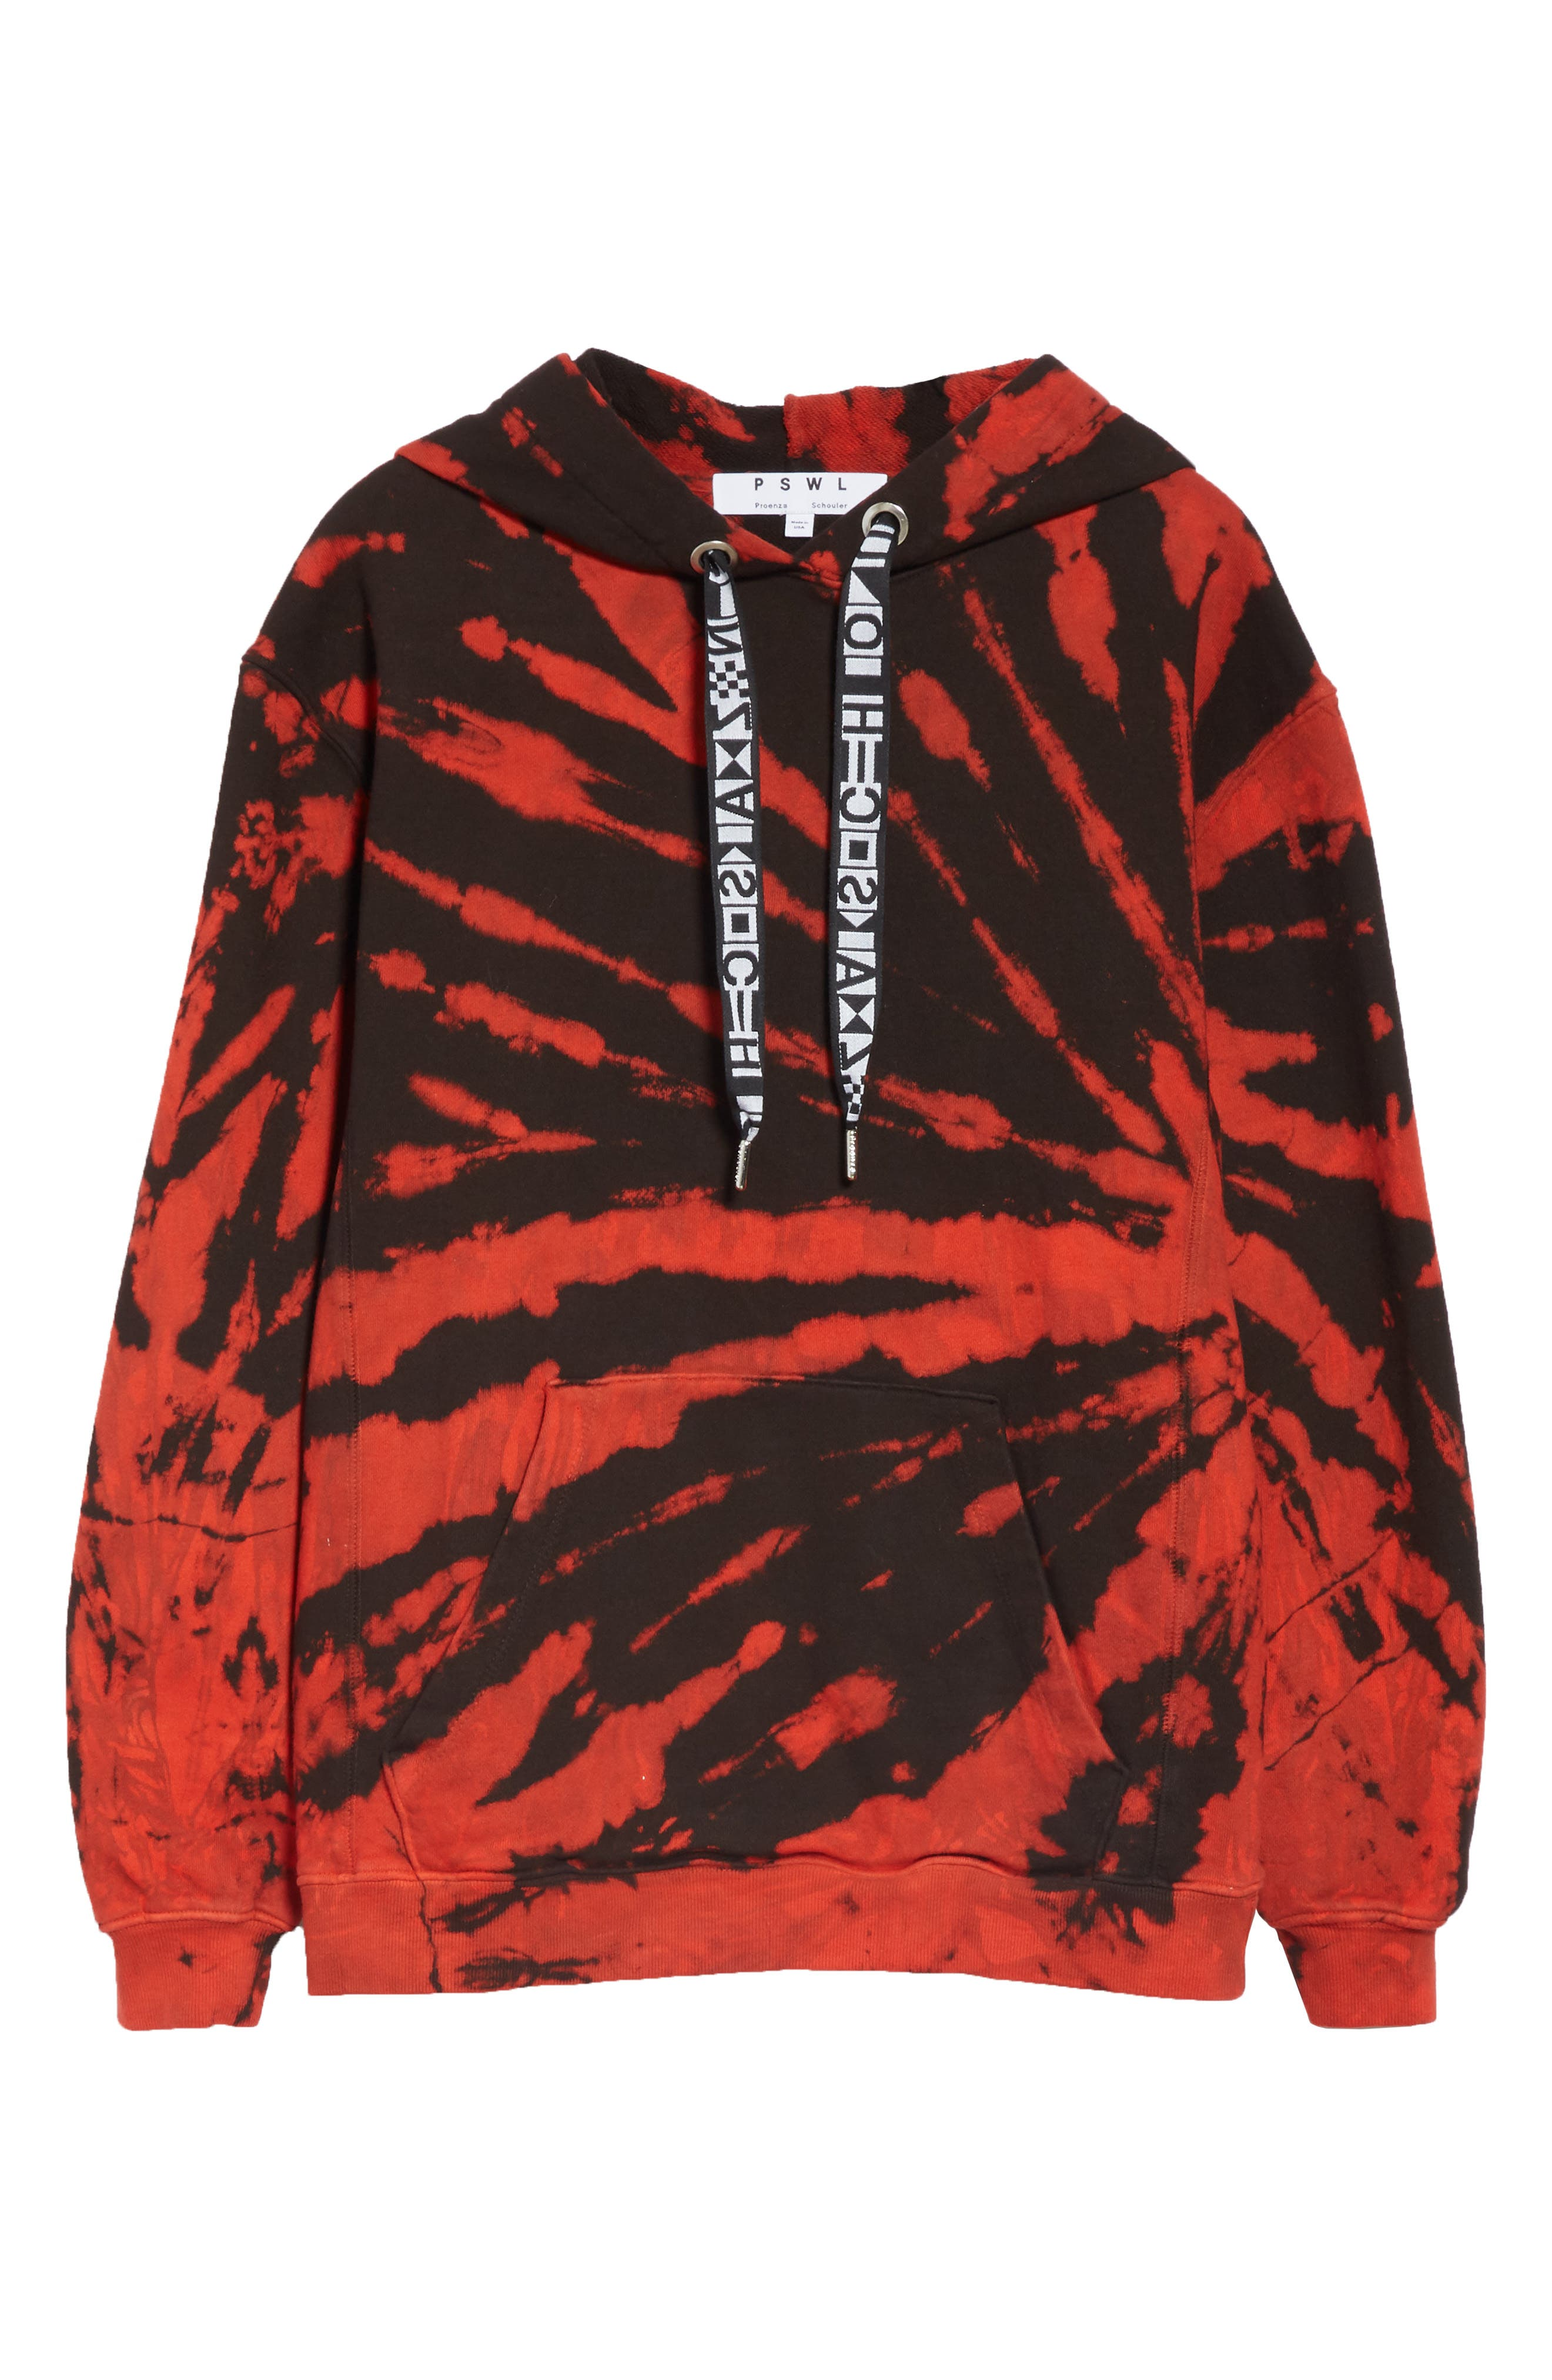 PROENZA SCHOULER, PSWL Tie Dye Hoodie, Alternate thumbnail 6, color, RED/ BLACK